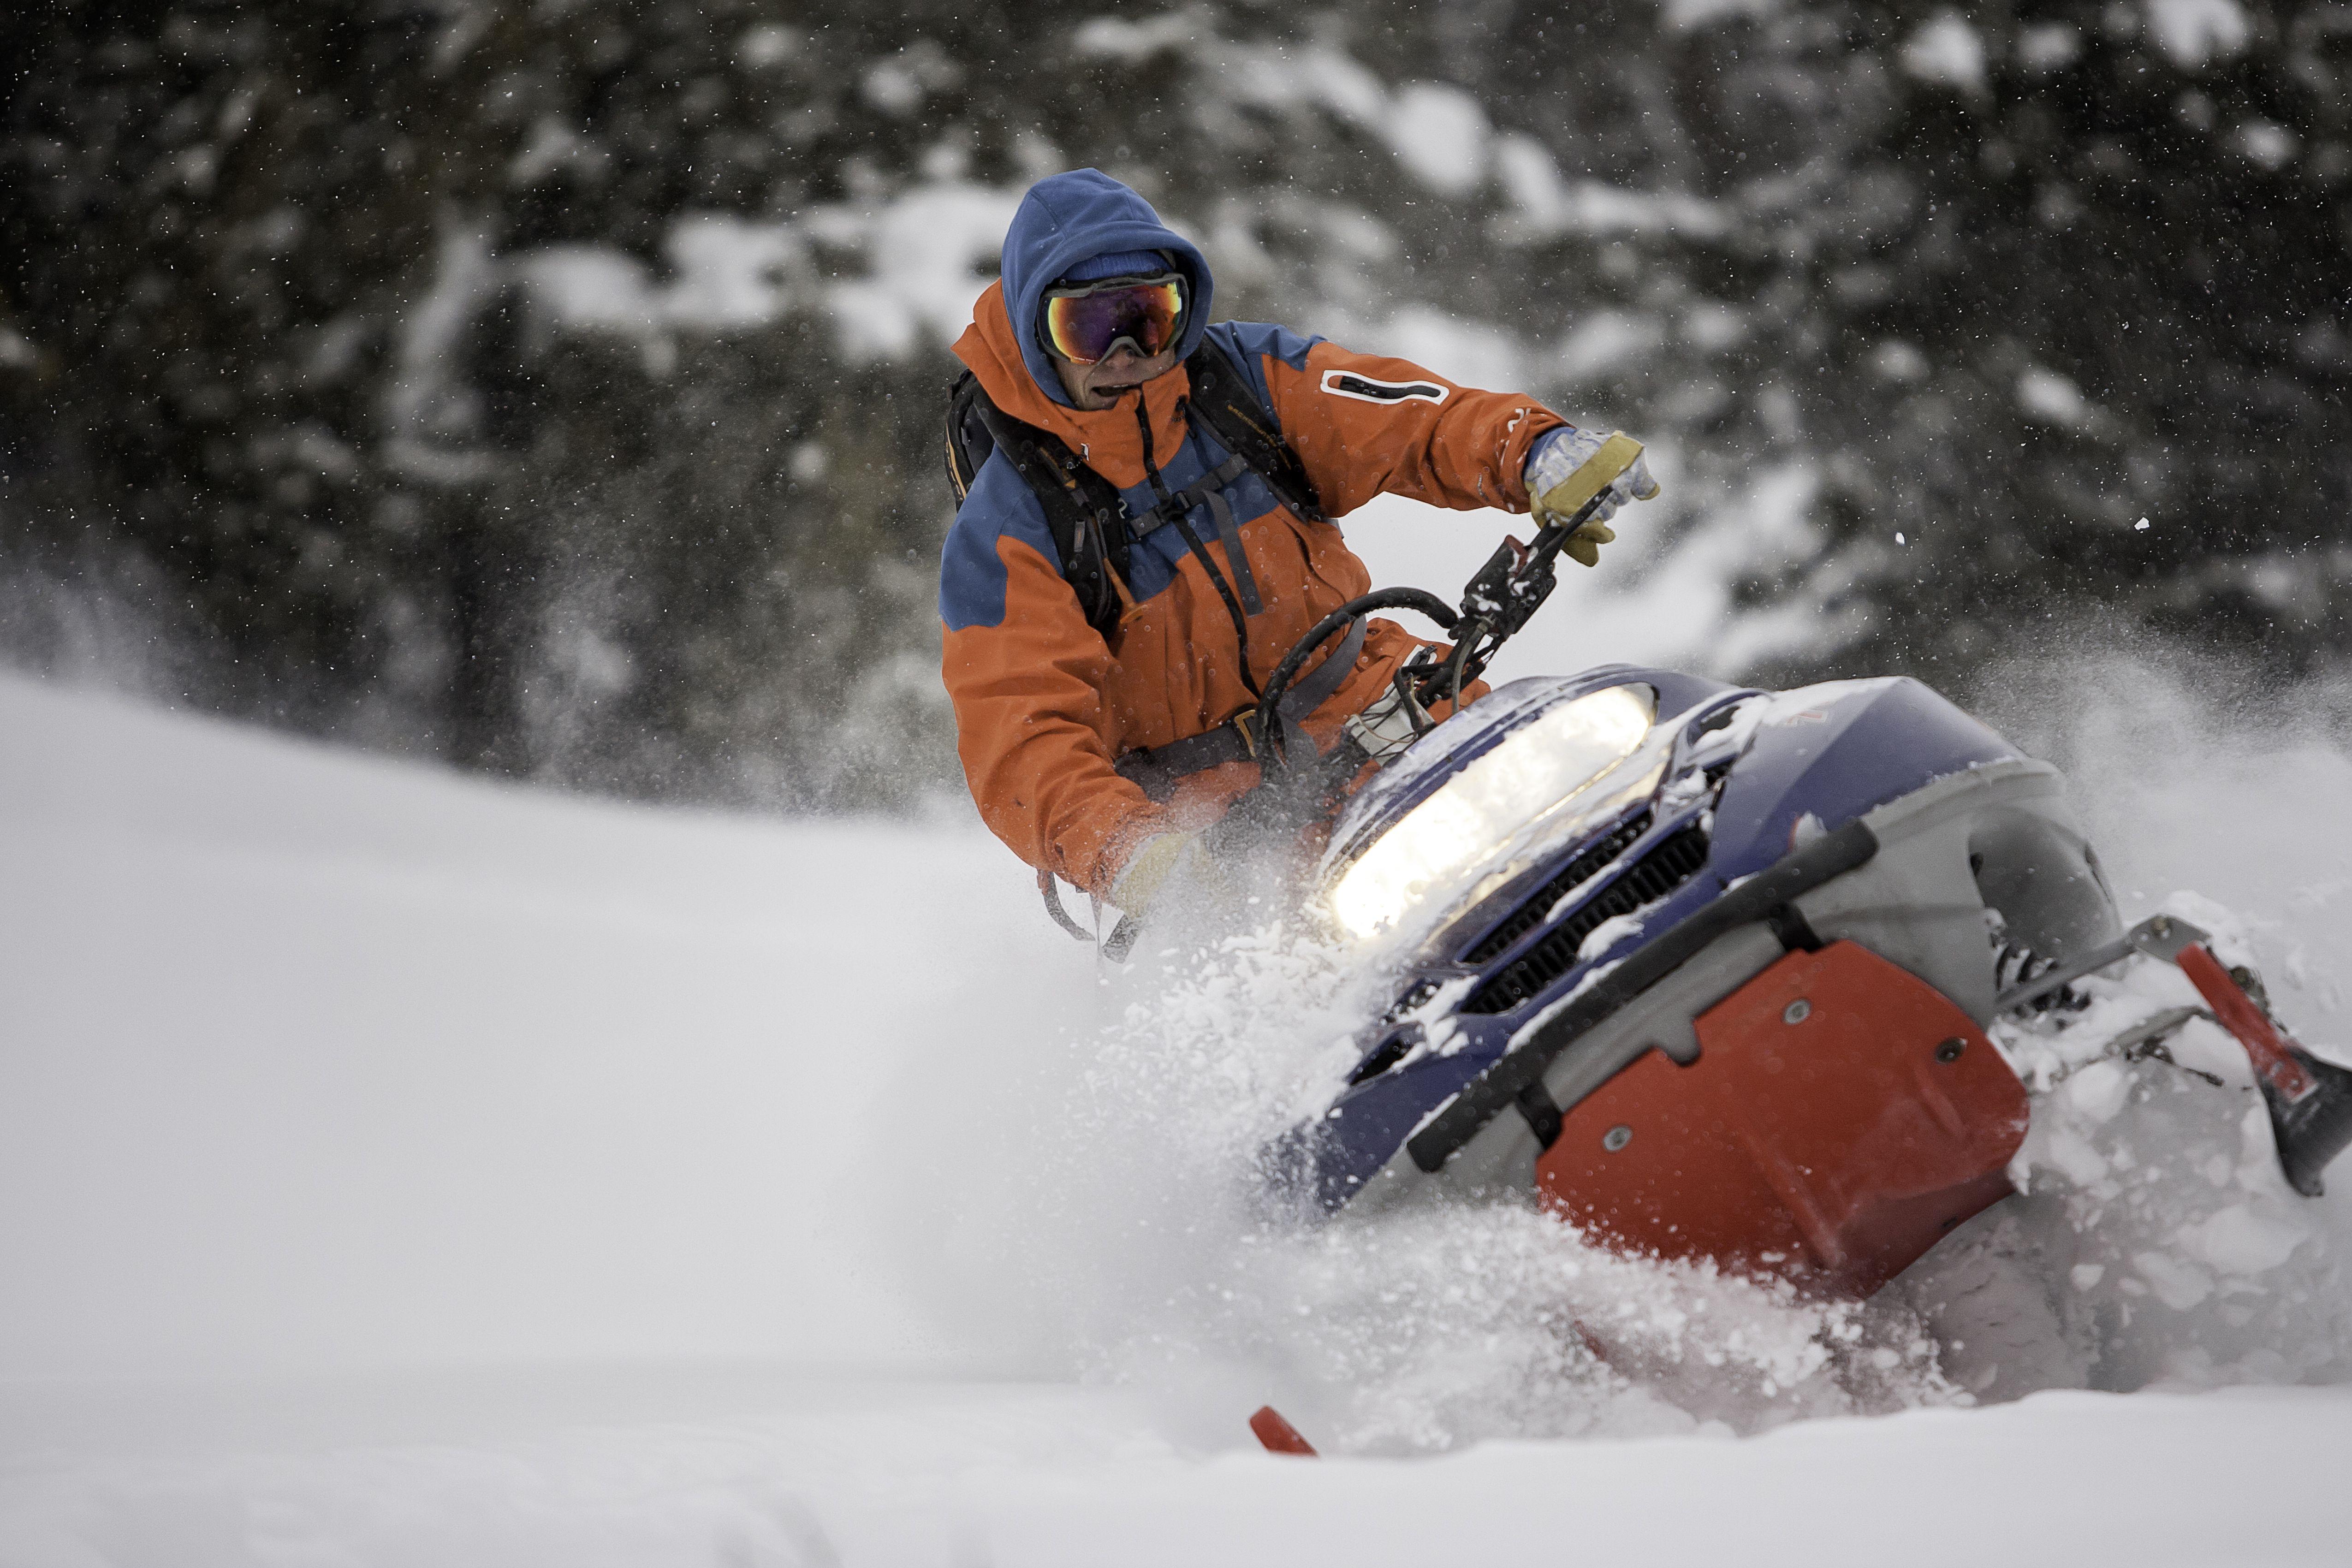 Guy on a snowmobile taking a powder turn.